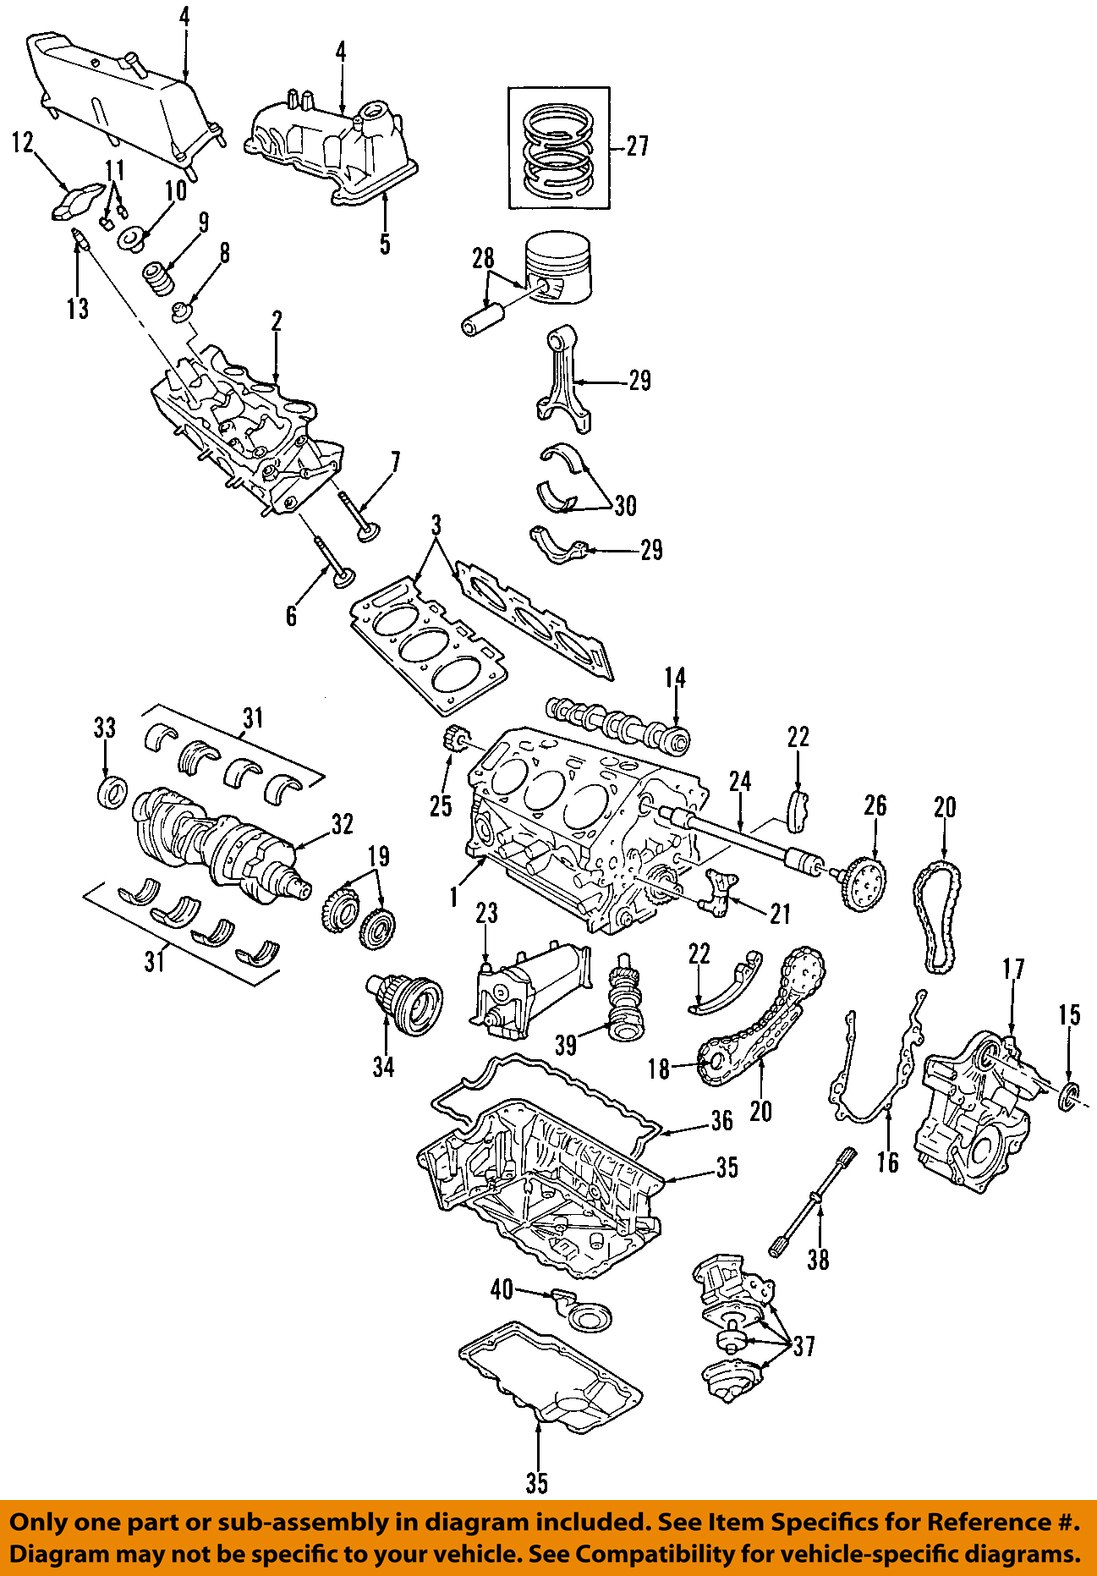 ford oem-engine crankshaft crank seal 5h2z6700aa | ebay 40 ford engine diagram crankshaft